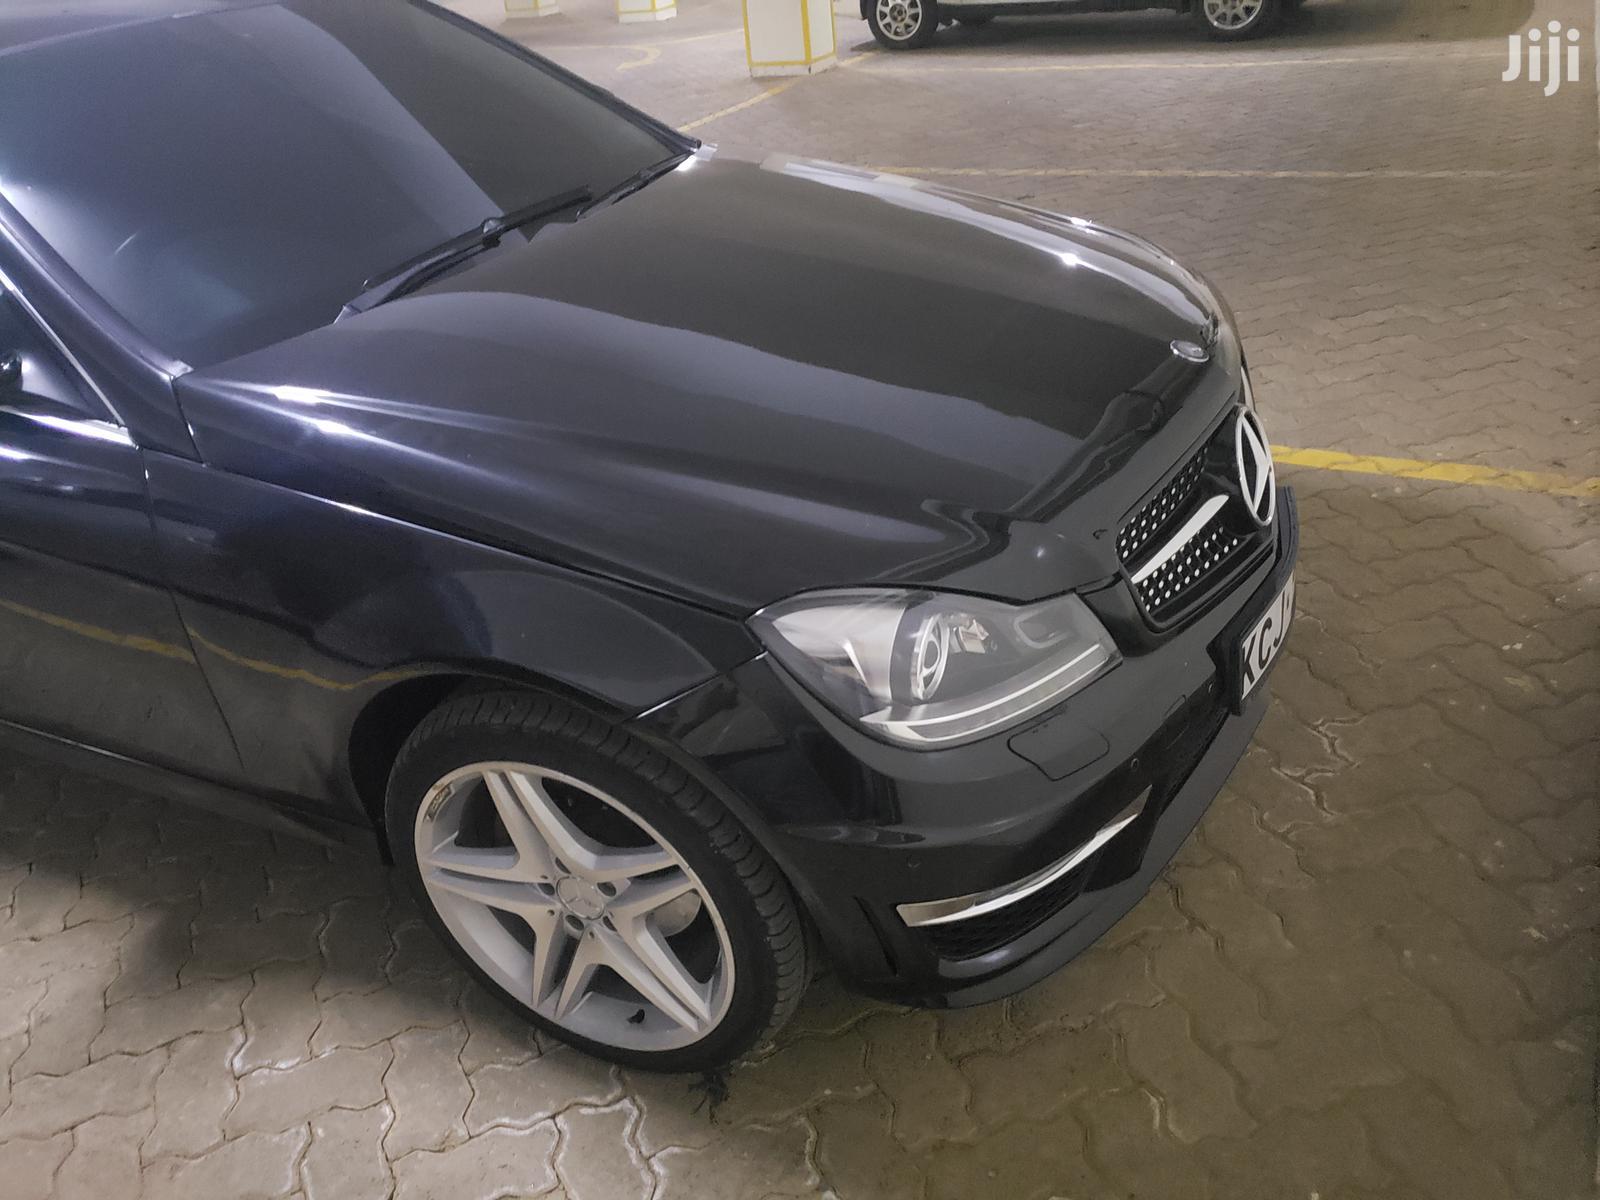 Mercedes Benz C200 W204 Bonnet In Nairobi Central Vehicle Parts Accessories Robert Oberoi Jiji Co Ke For Sale In Nairobi Central Buy Vehicle Parts Accessories From Robert Oberoi On